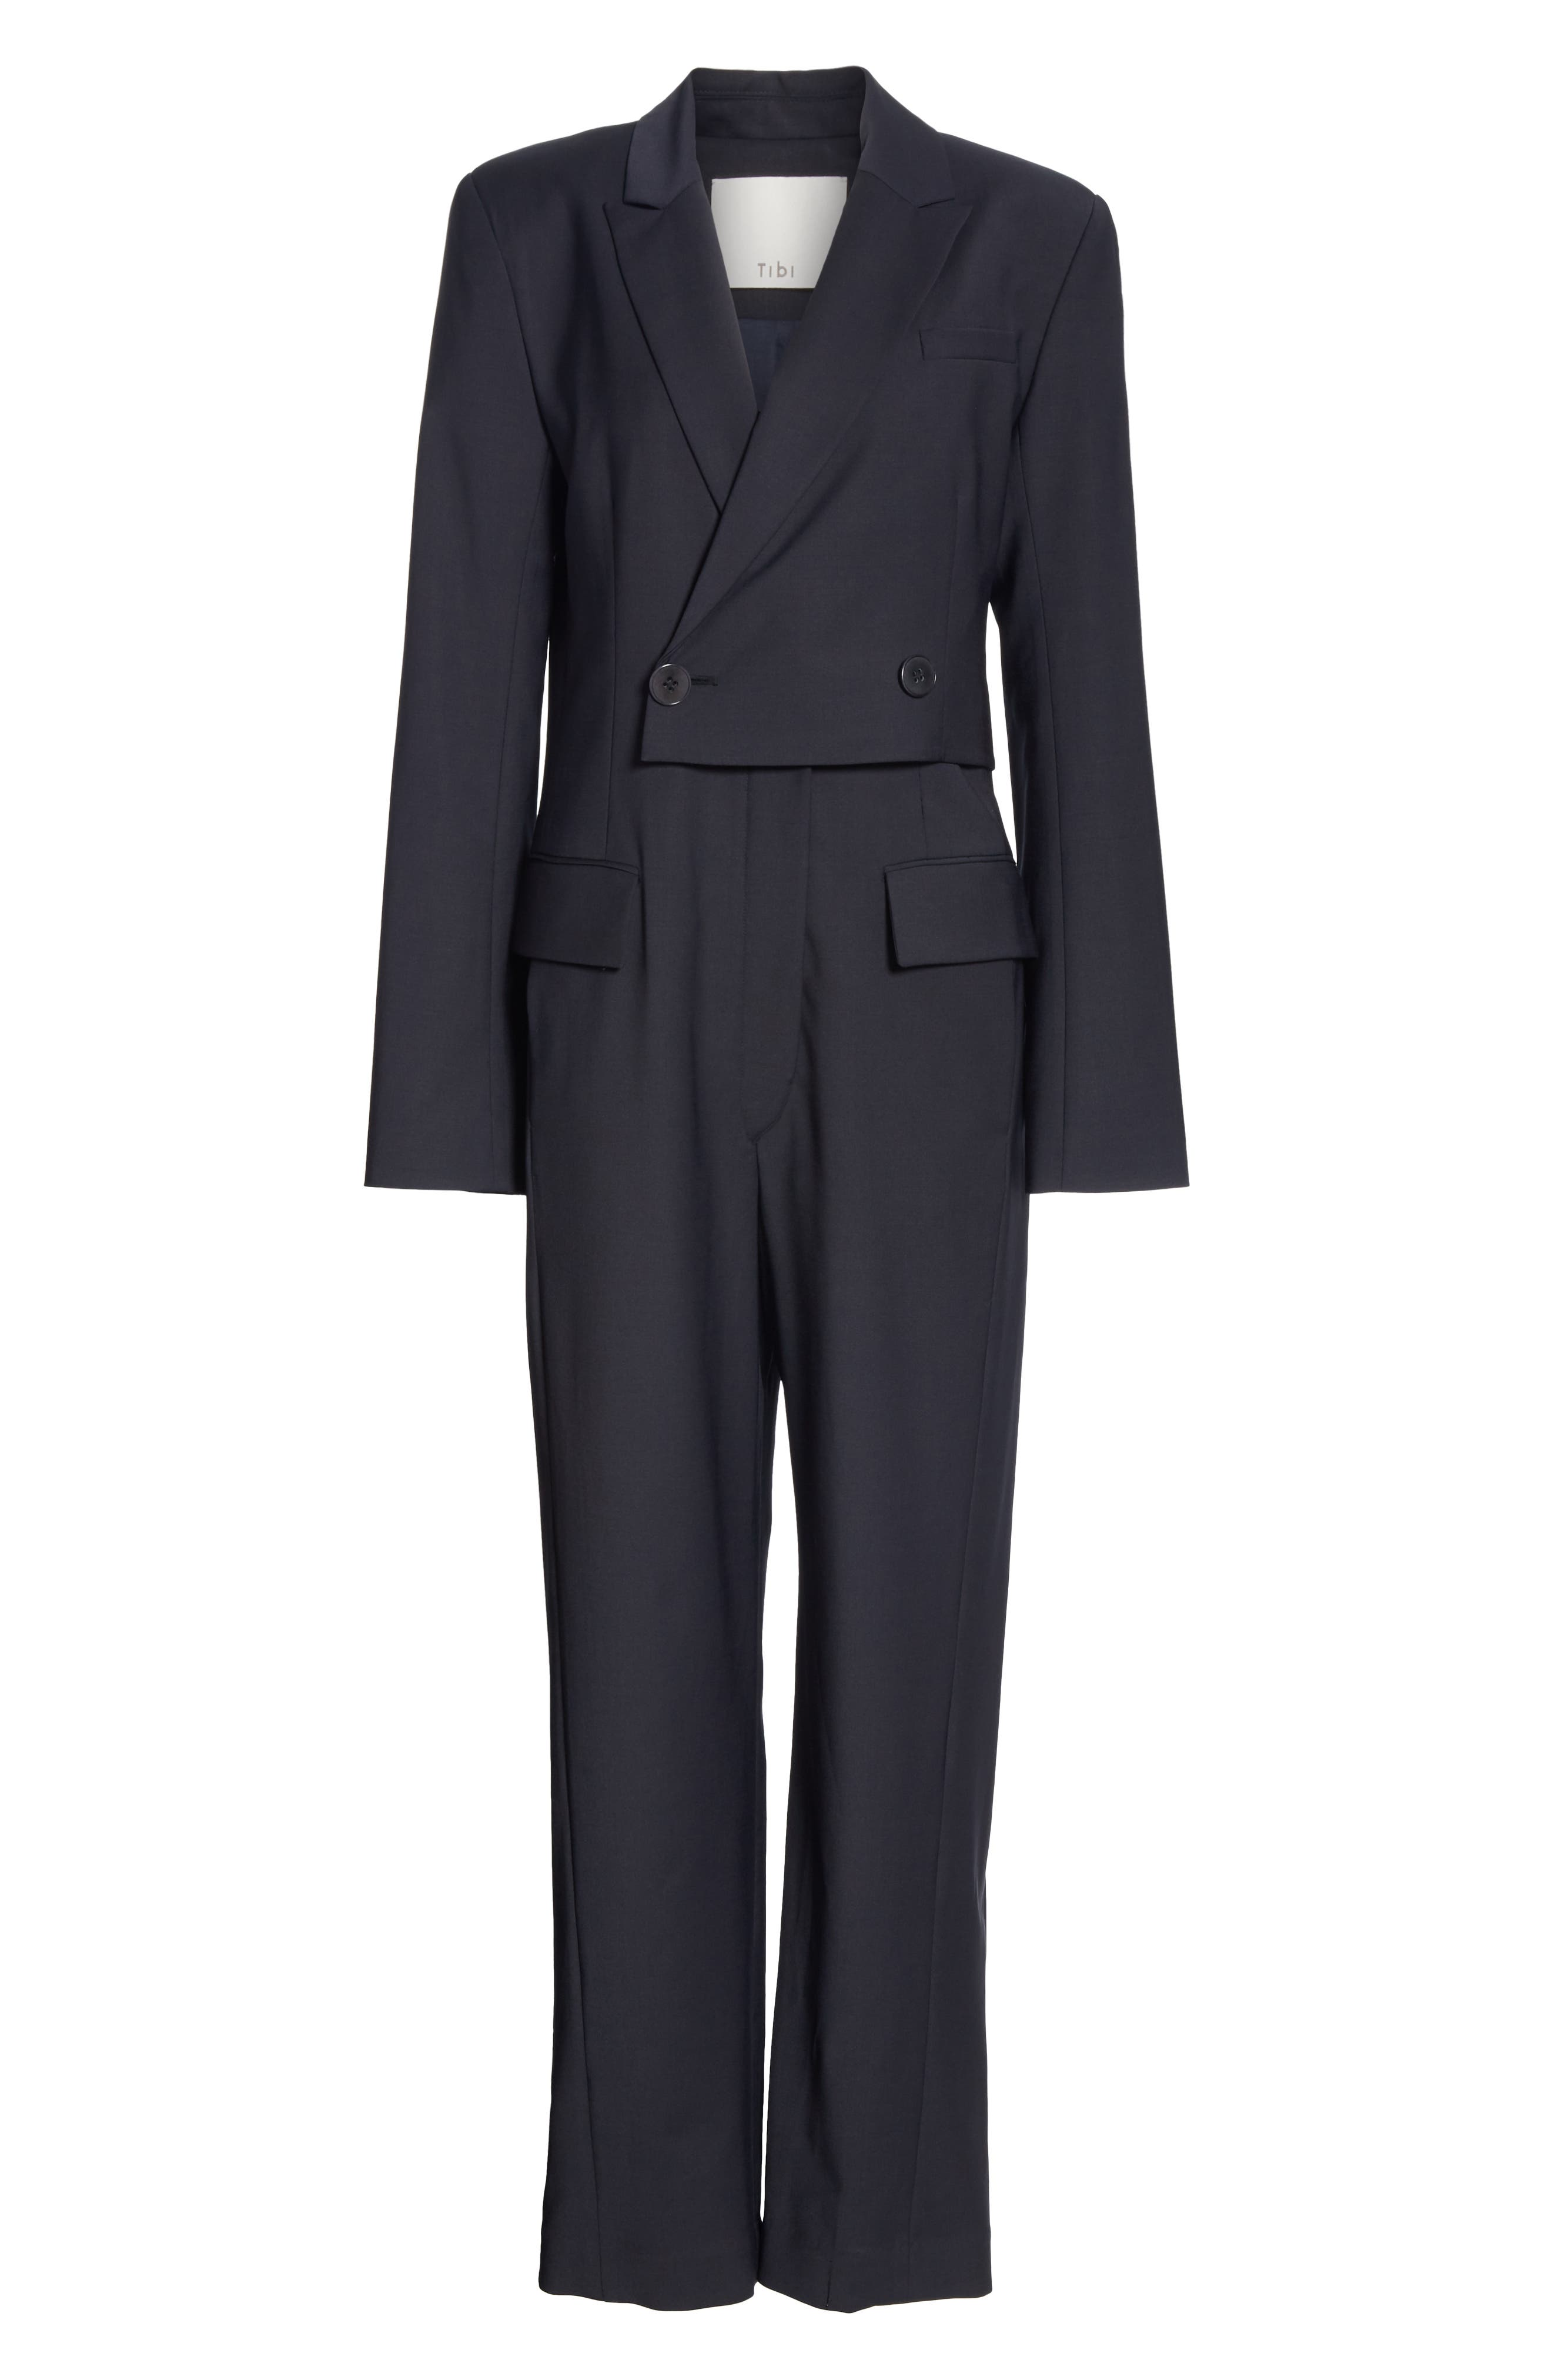 TIBI,                             Plain Weave Blazer Jumpsuit,                             Alternate thumbnail 7, color,                             DARK NAVY